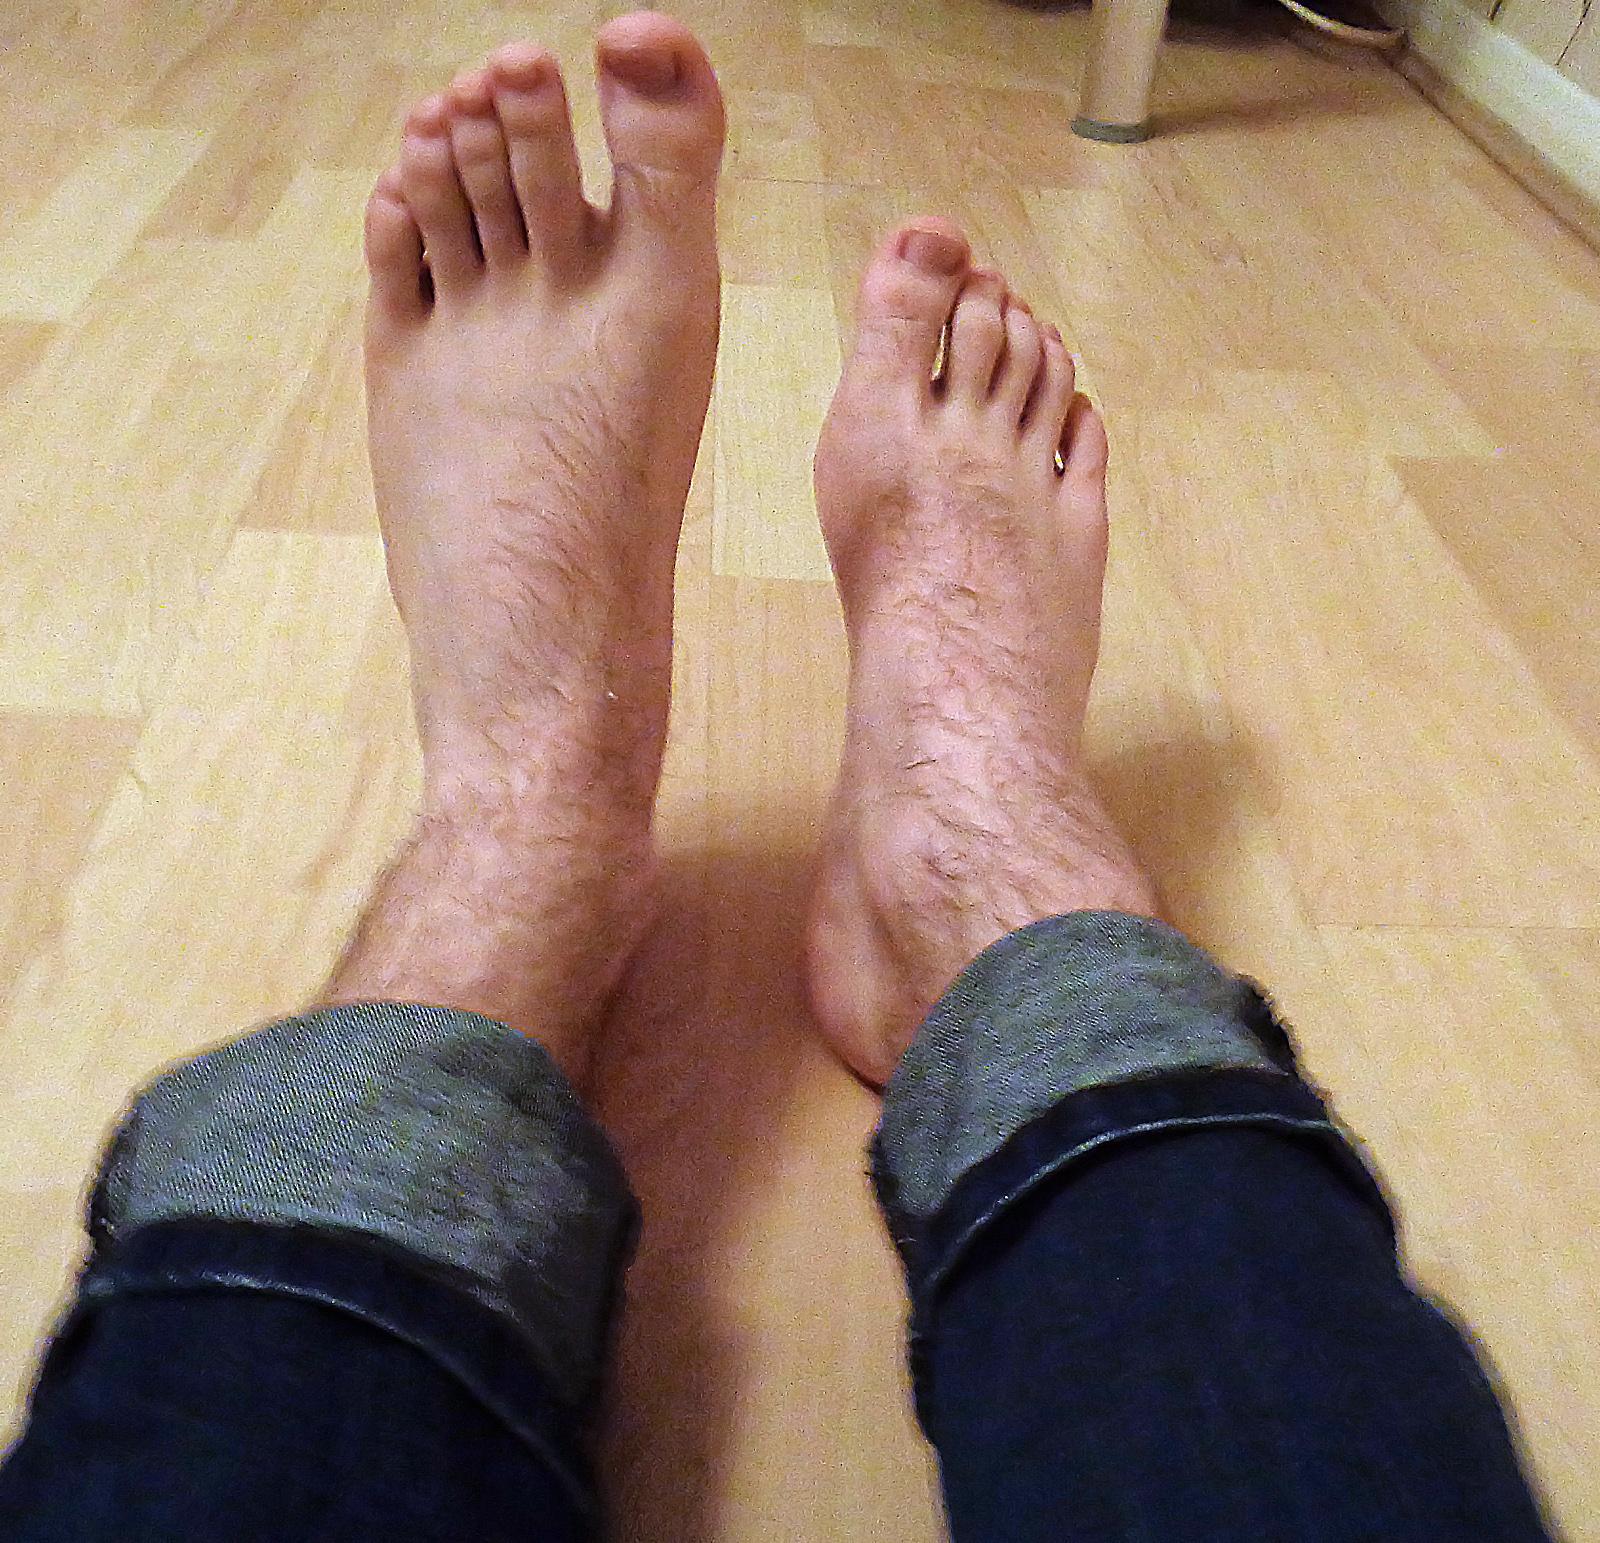 Foot Drop, No Other Symptoms: ALS or Brain Tumor?